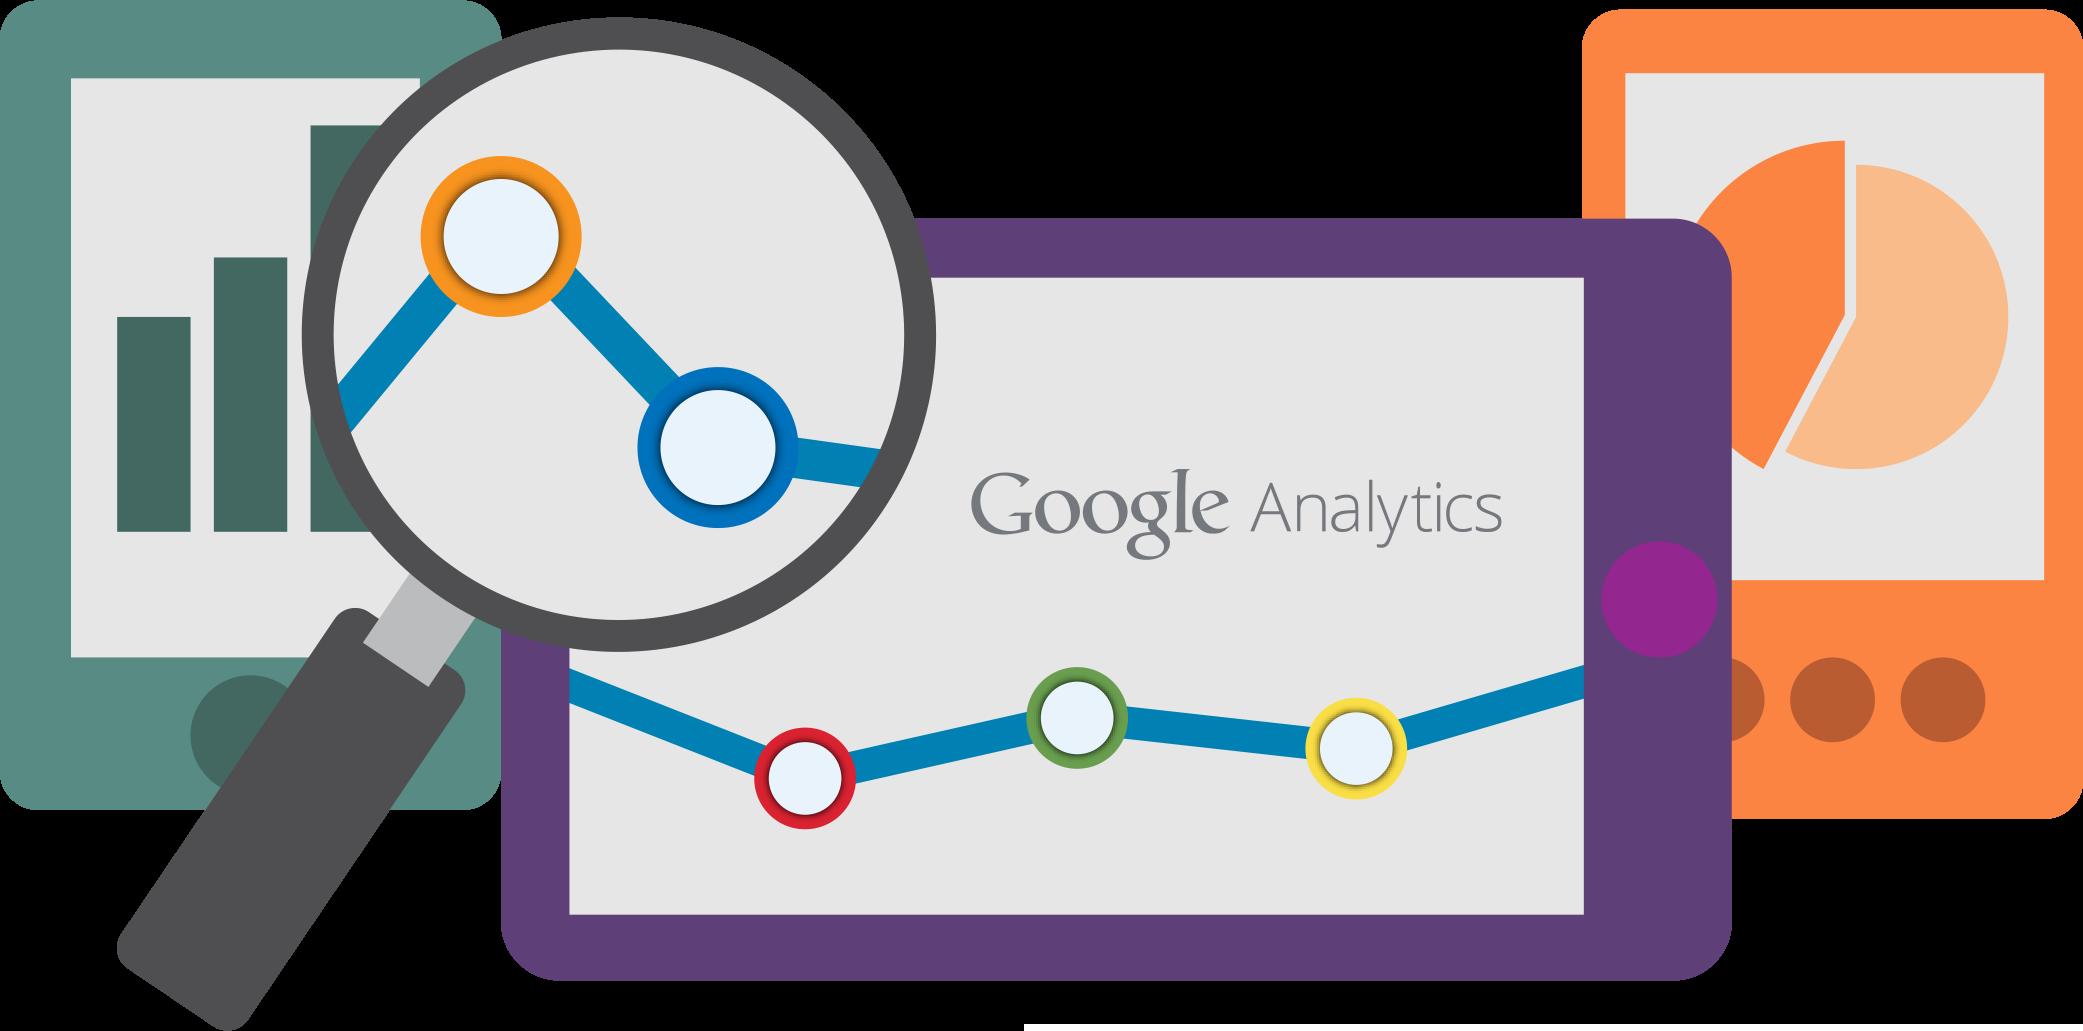 Training business insights and analytics